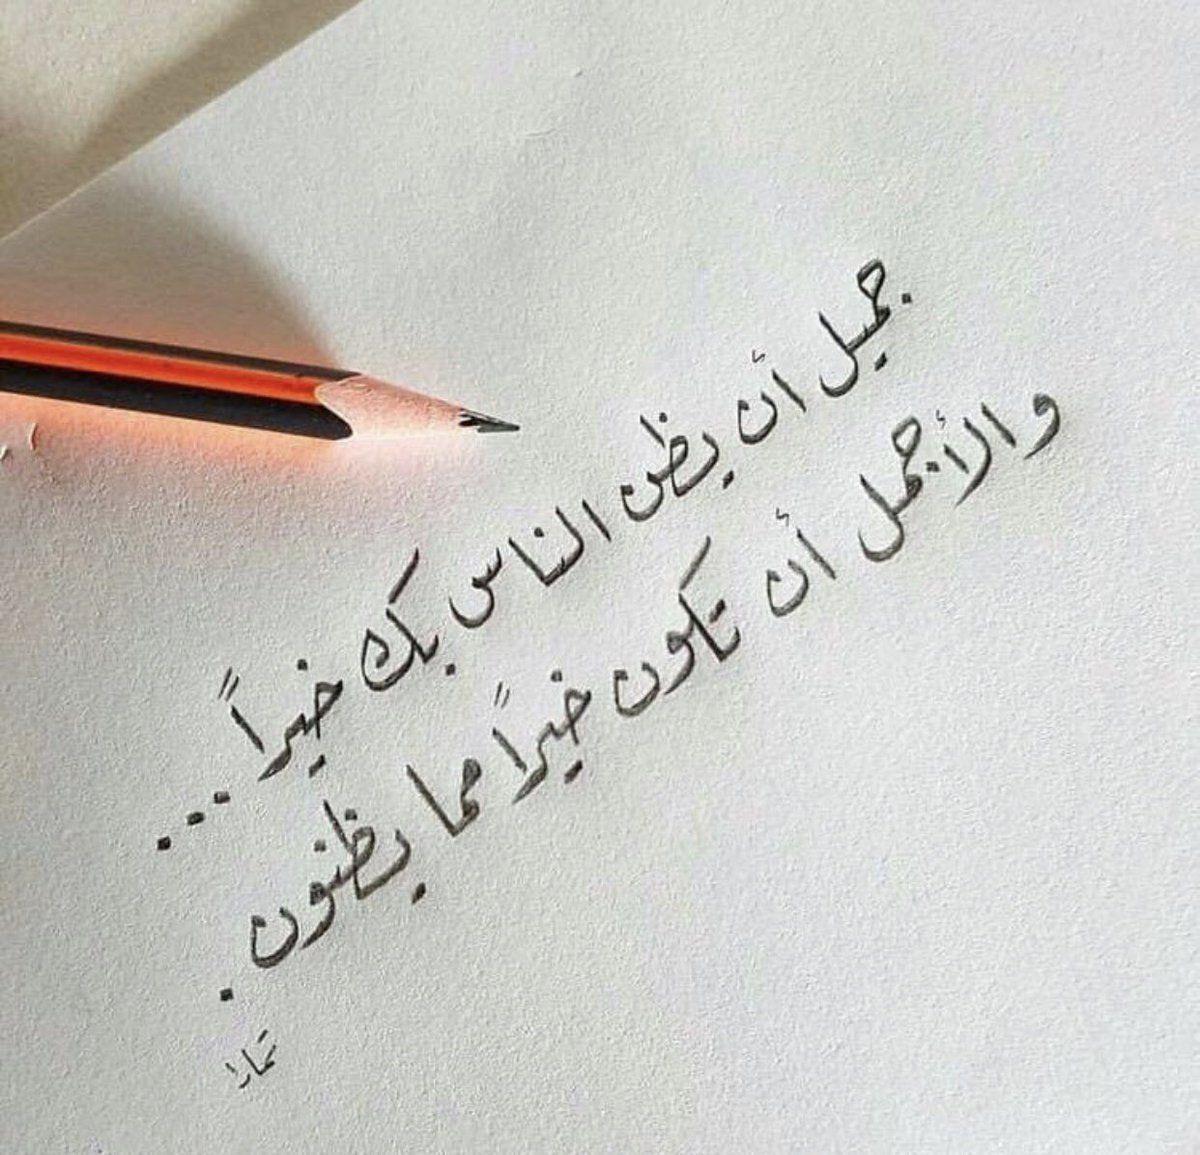 الجميل والاجمل Calligraphy Quotes Love Quran Quotes Love Words Quotes